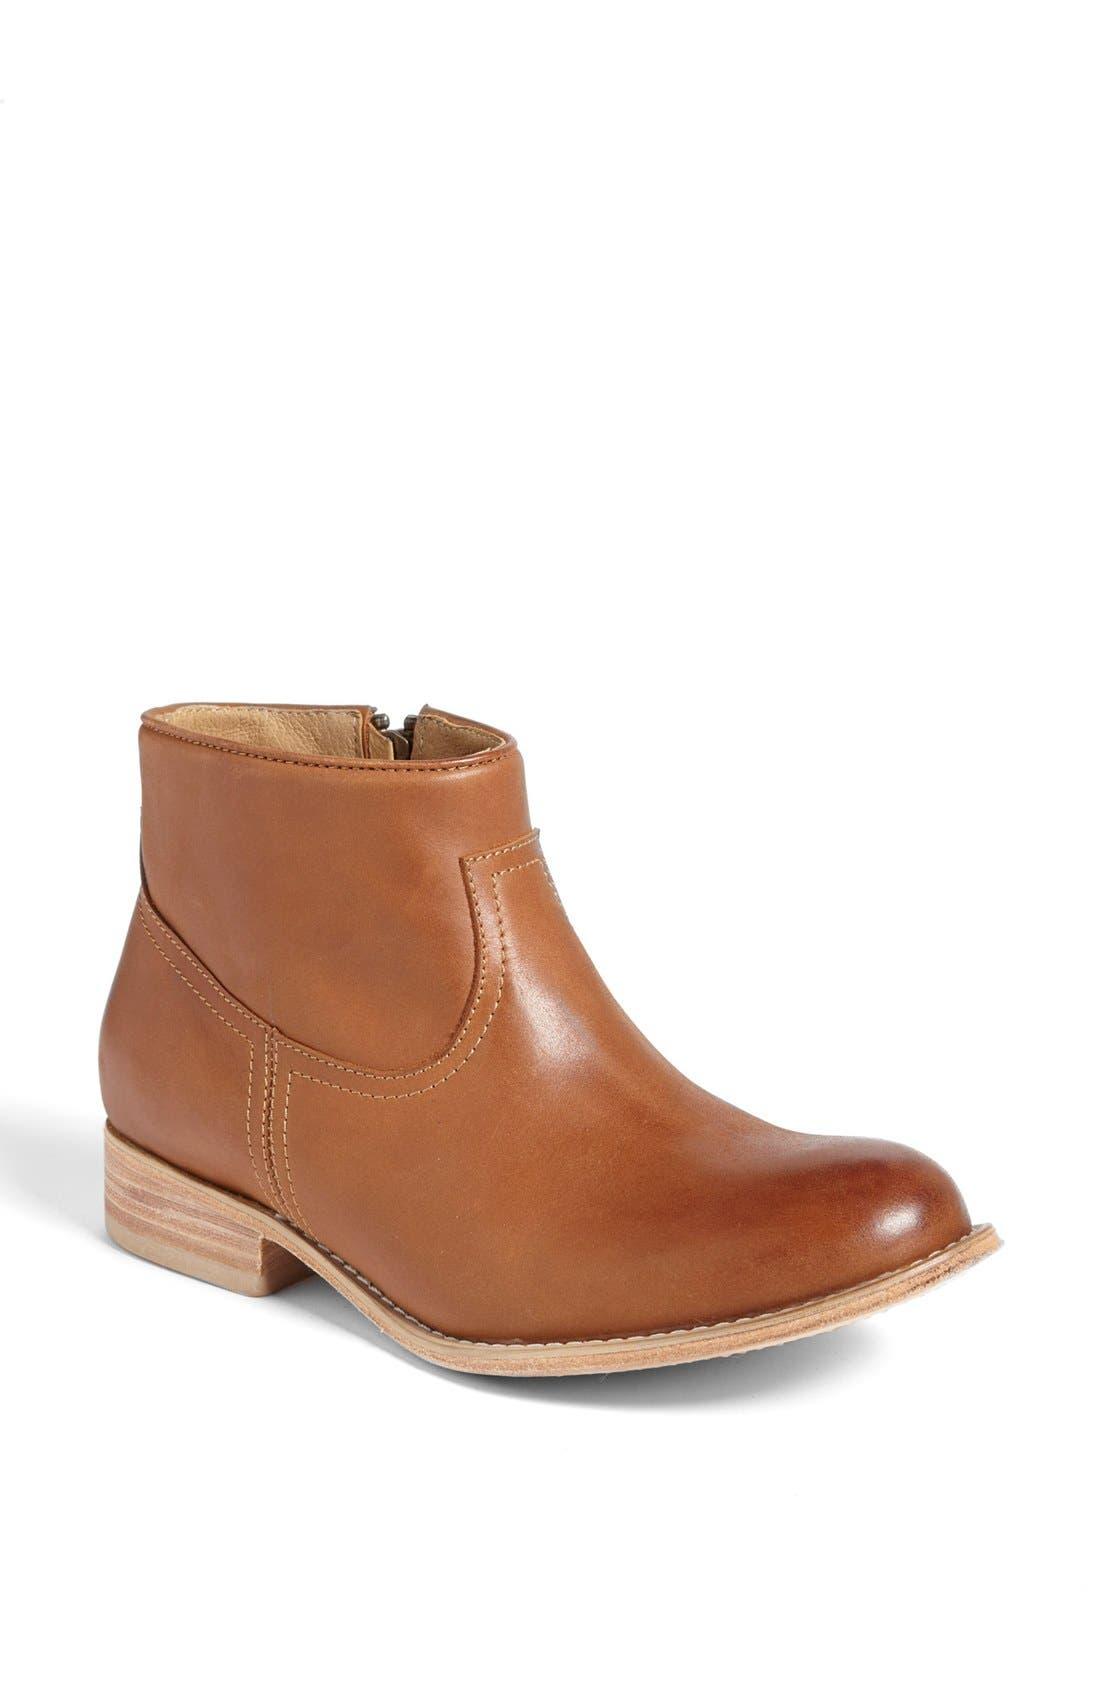 Alternate Image 1 Selected - Hinge 'Sabor' Short Boot